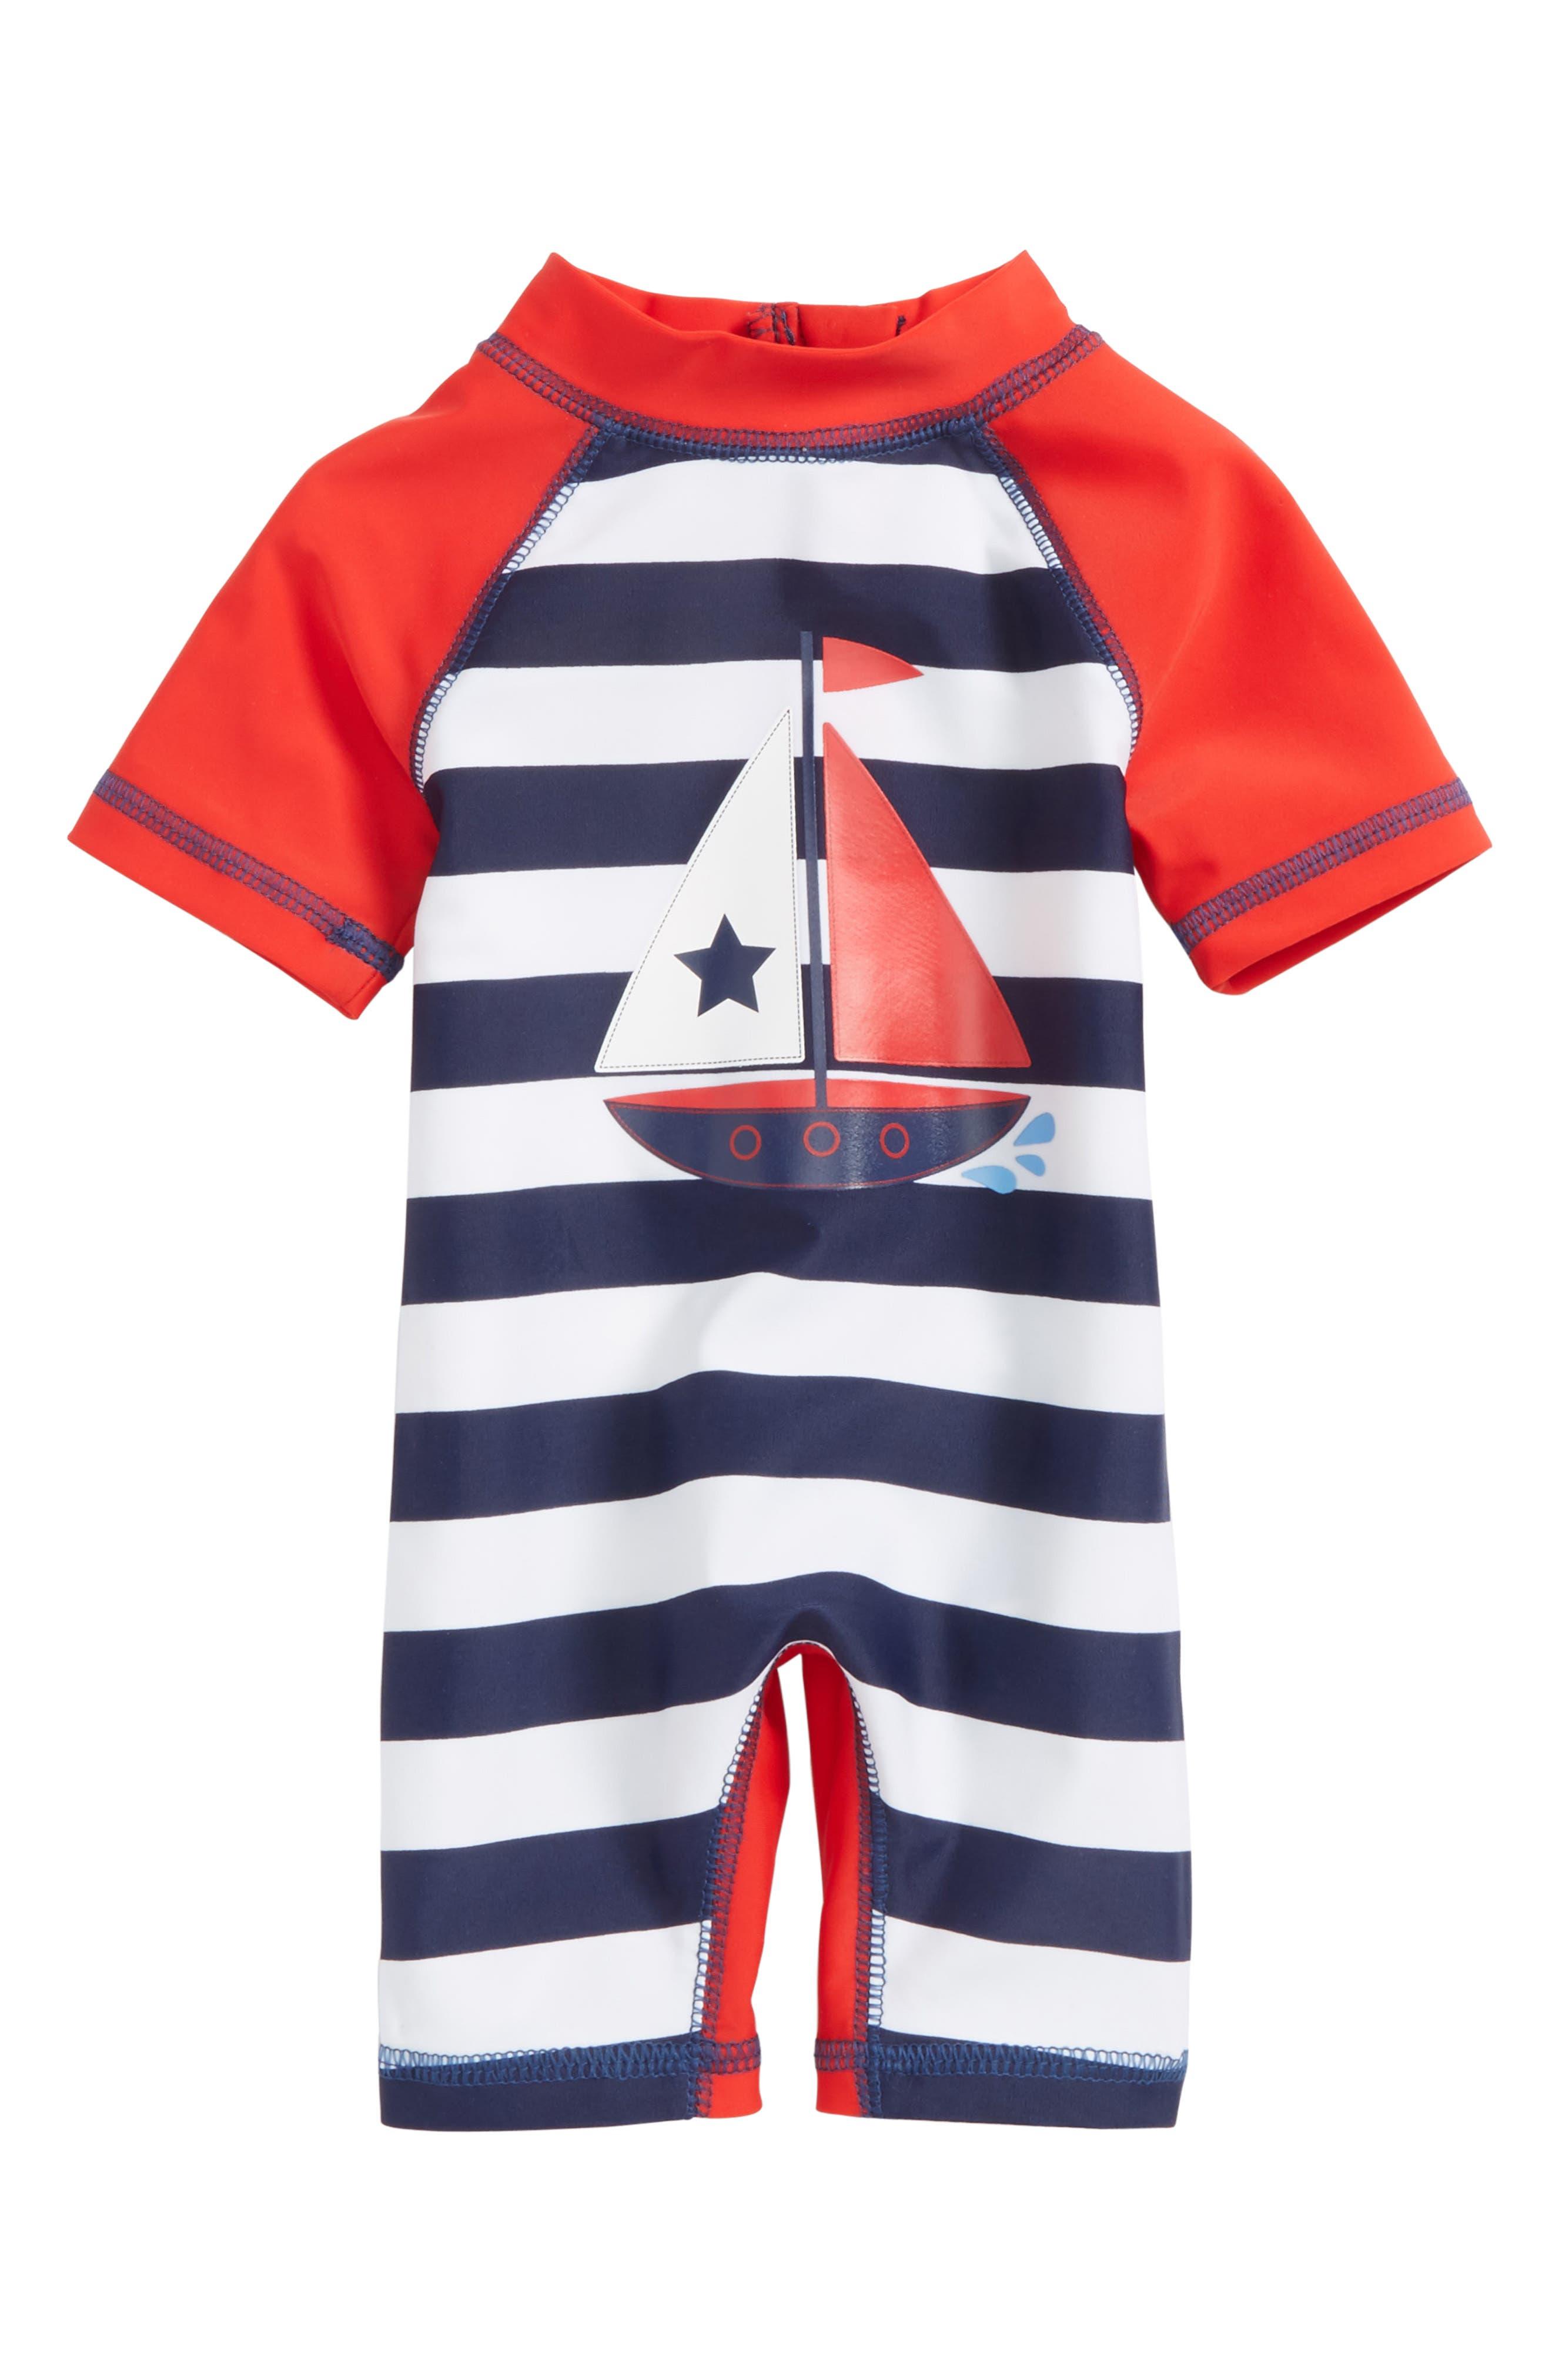 Sailboat UPF 50+ One-Piece Rashguard Swimsuit,                             Main thumbnail 1, color,                             450